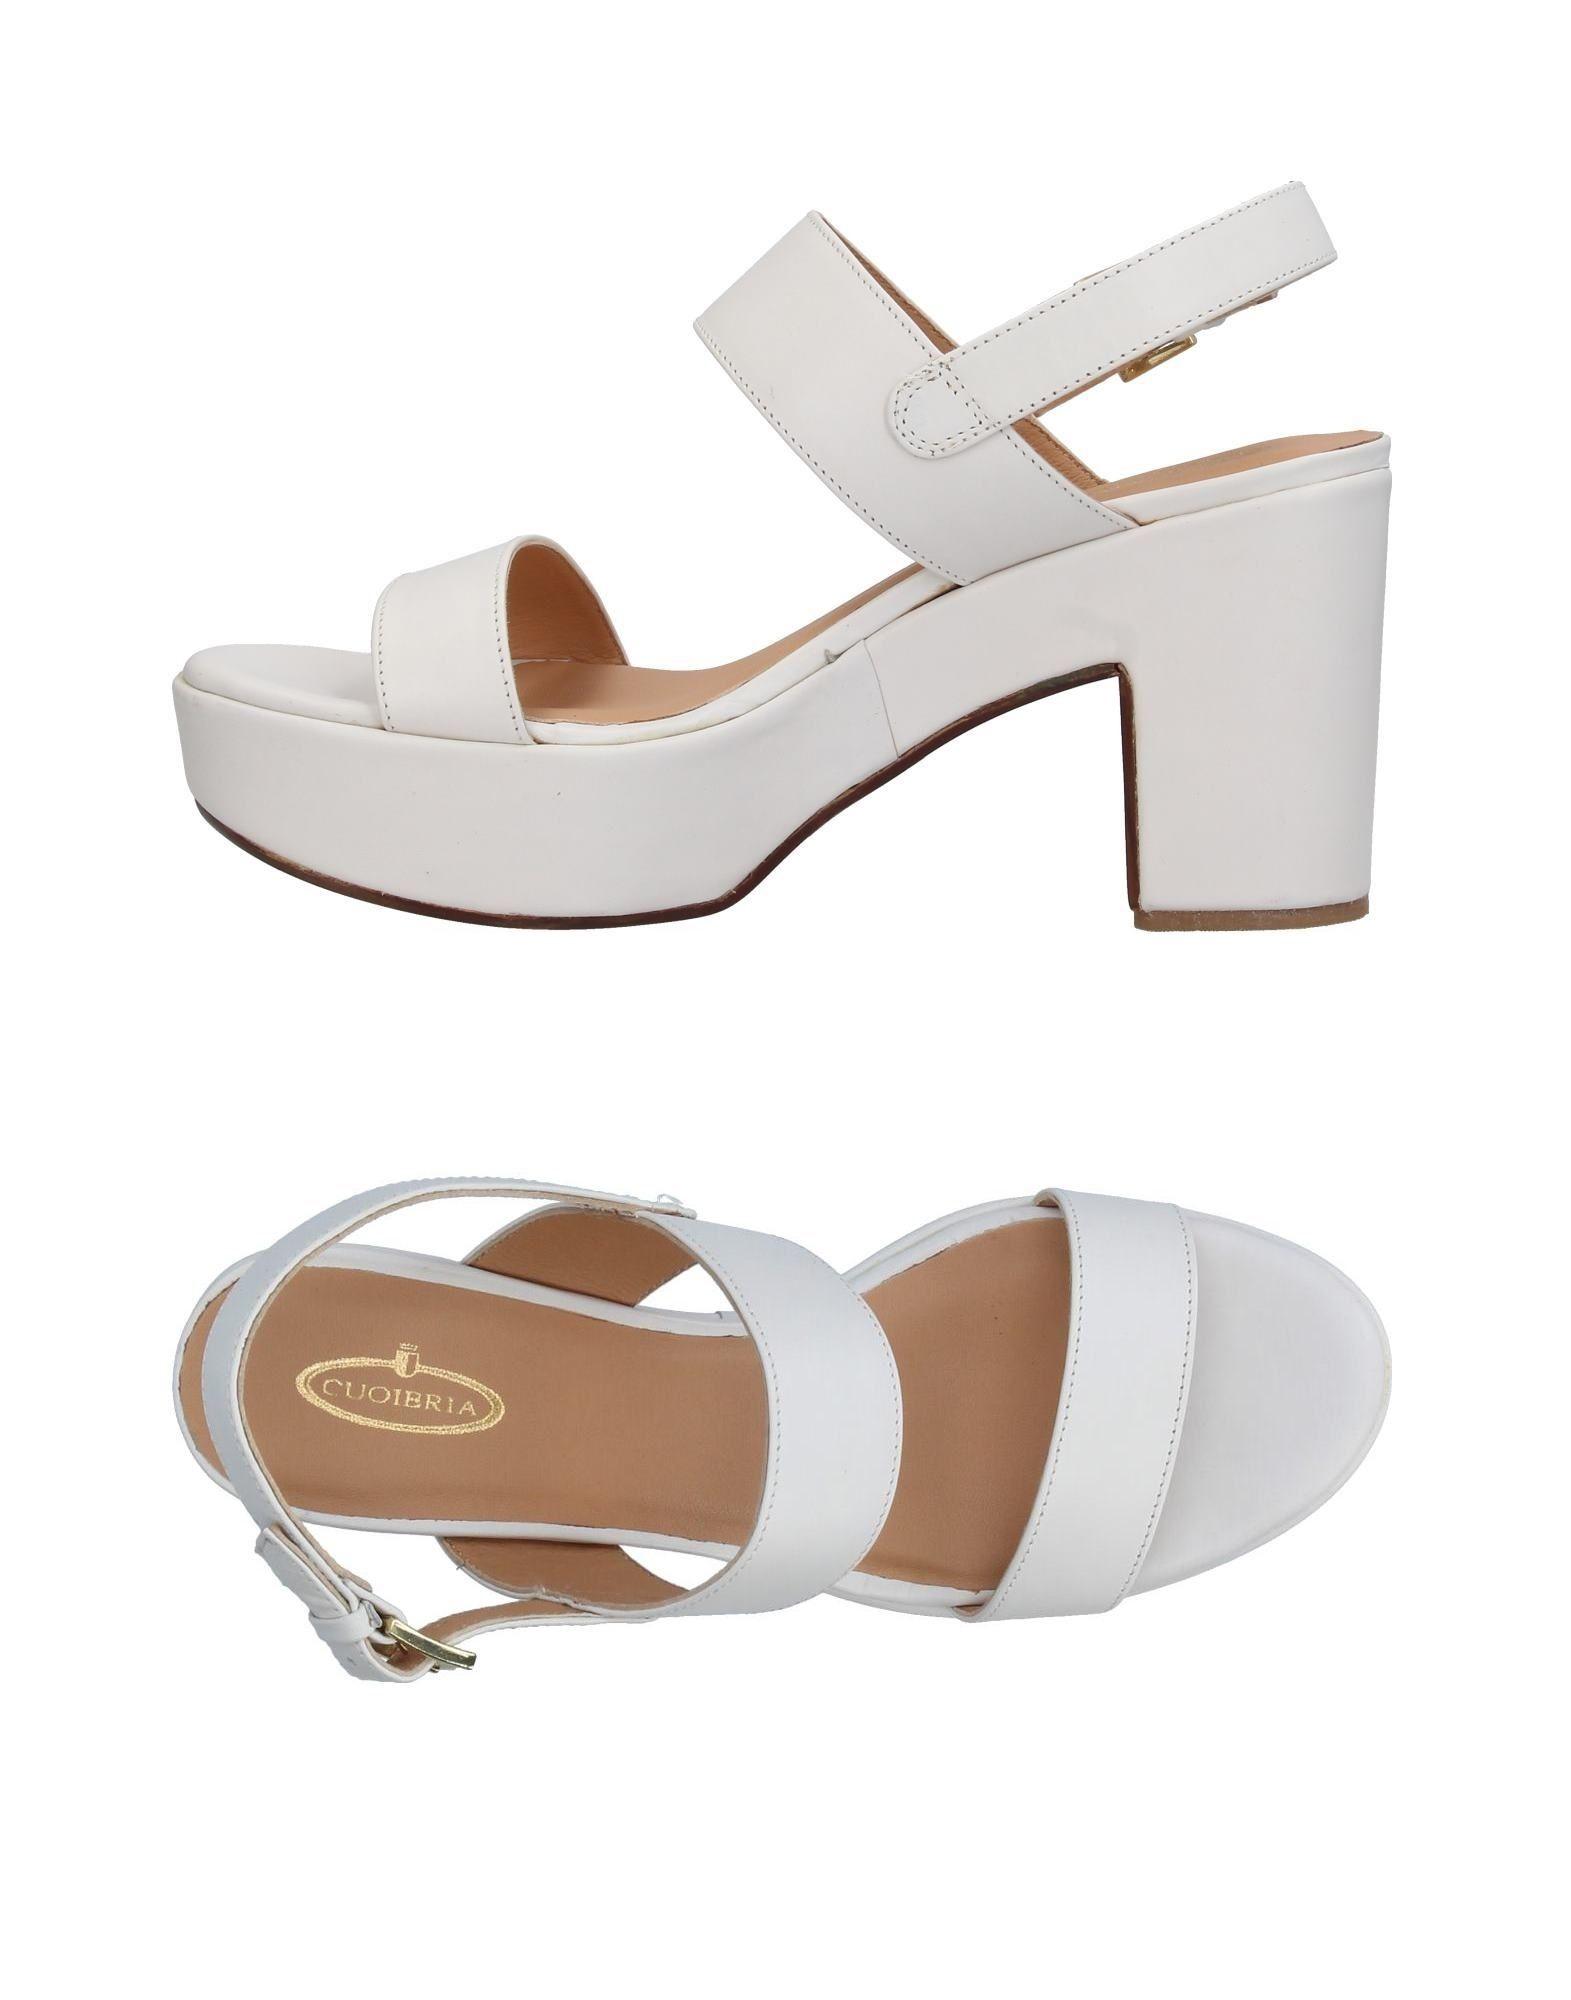 Cuoieria Sandalen Damen  11360386IV Gute Qualität beliebte Schuhe